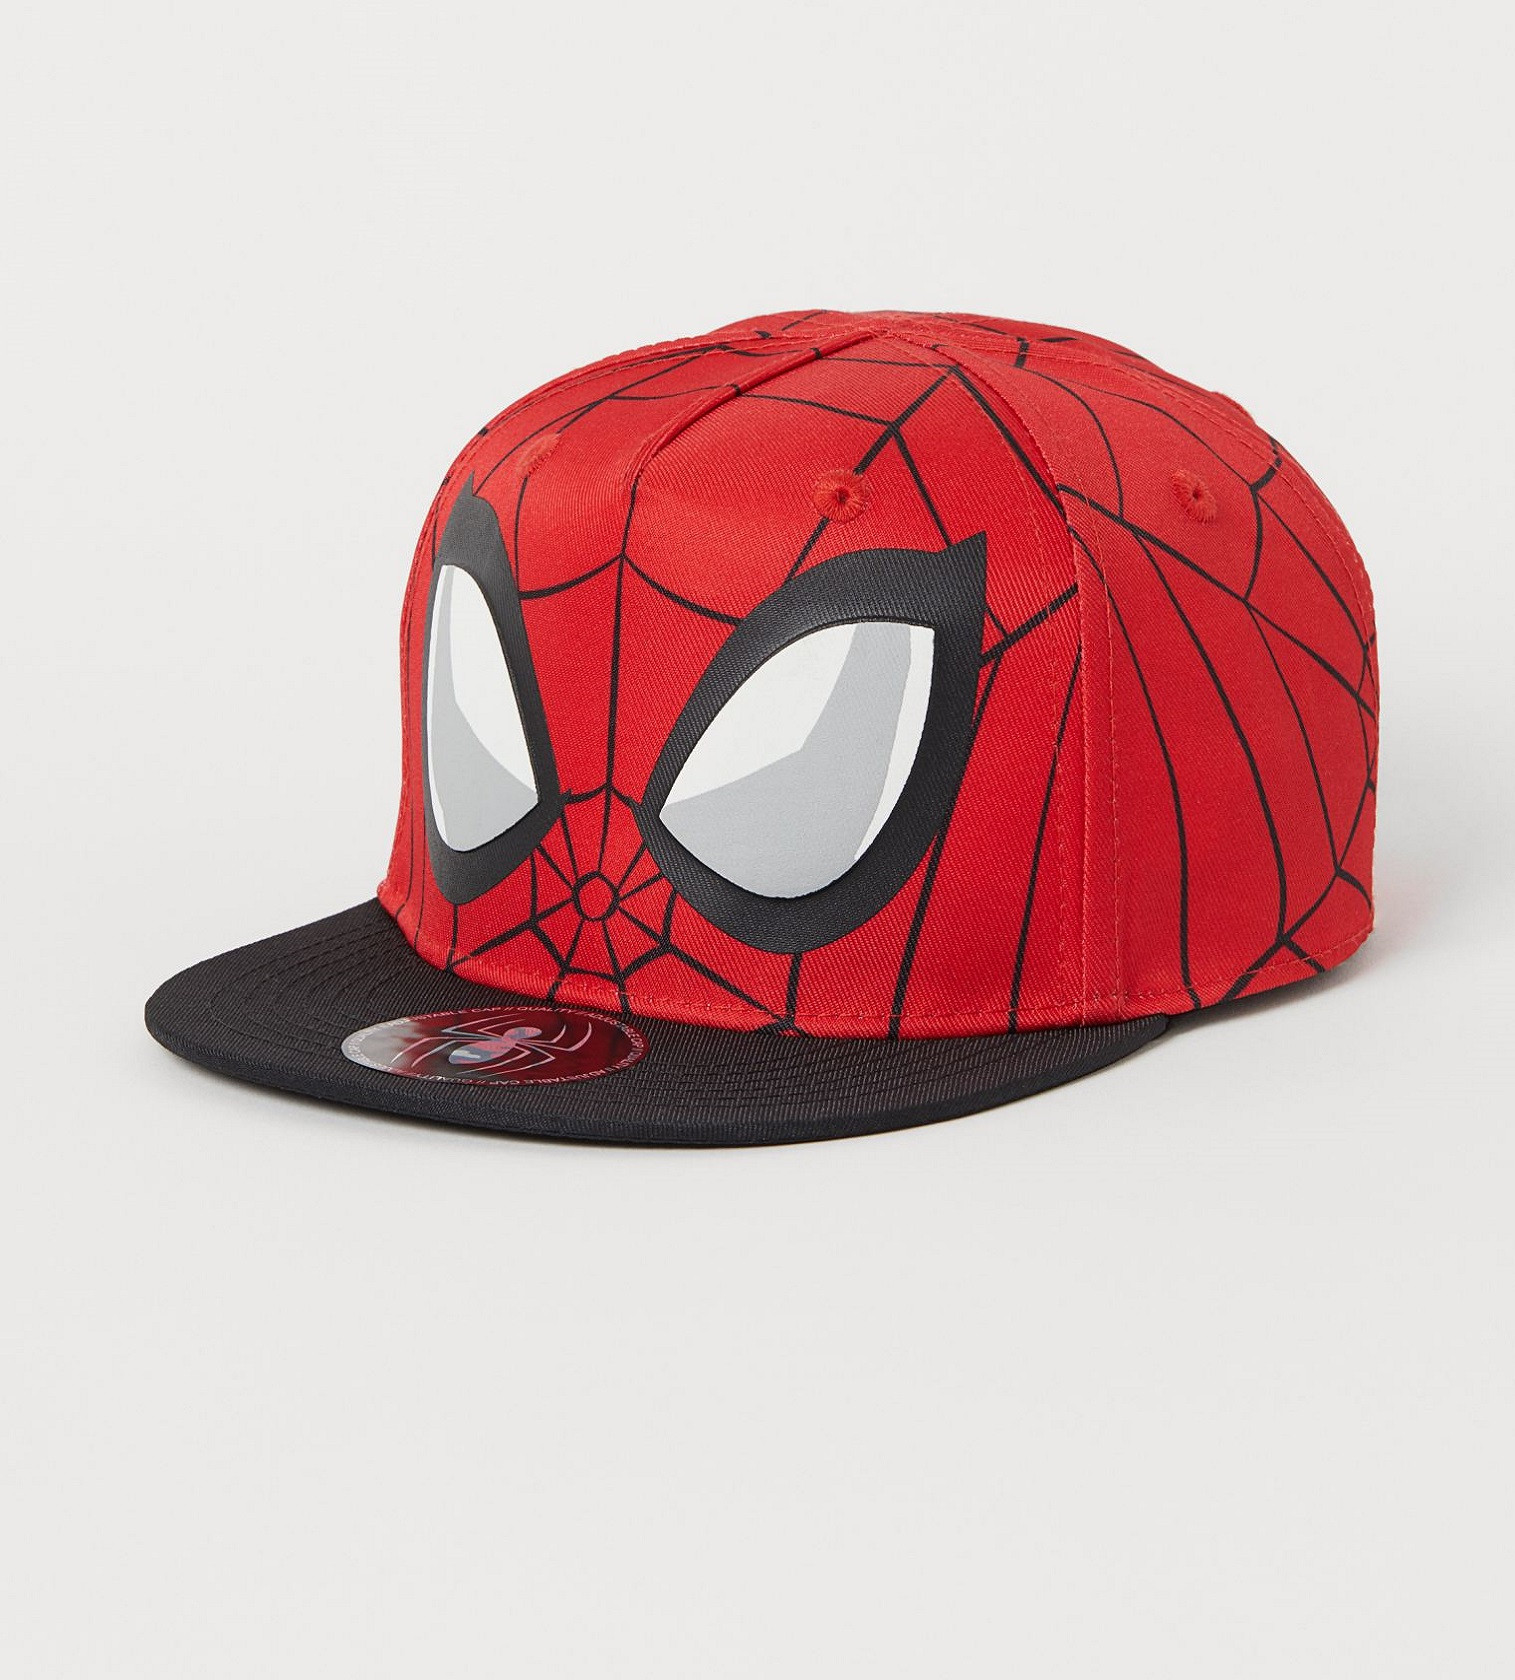 Купити Кепка H&M Red/Spider-Man - фото 1